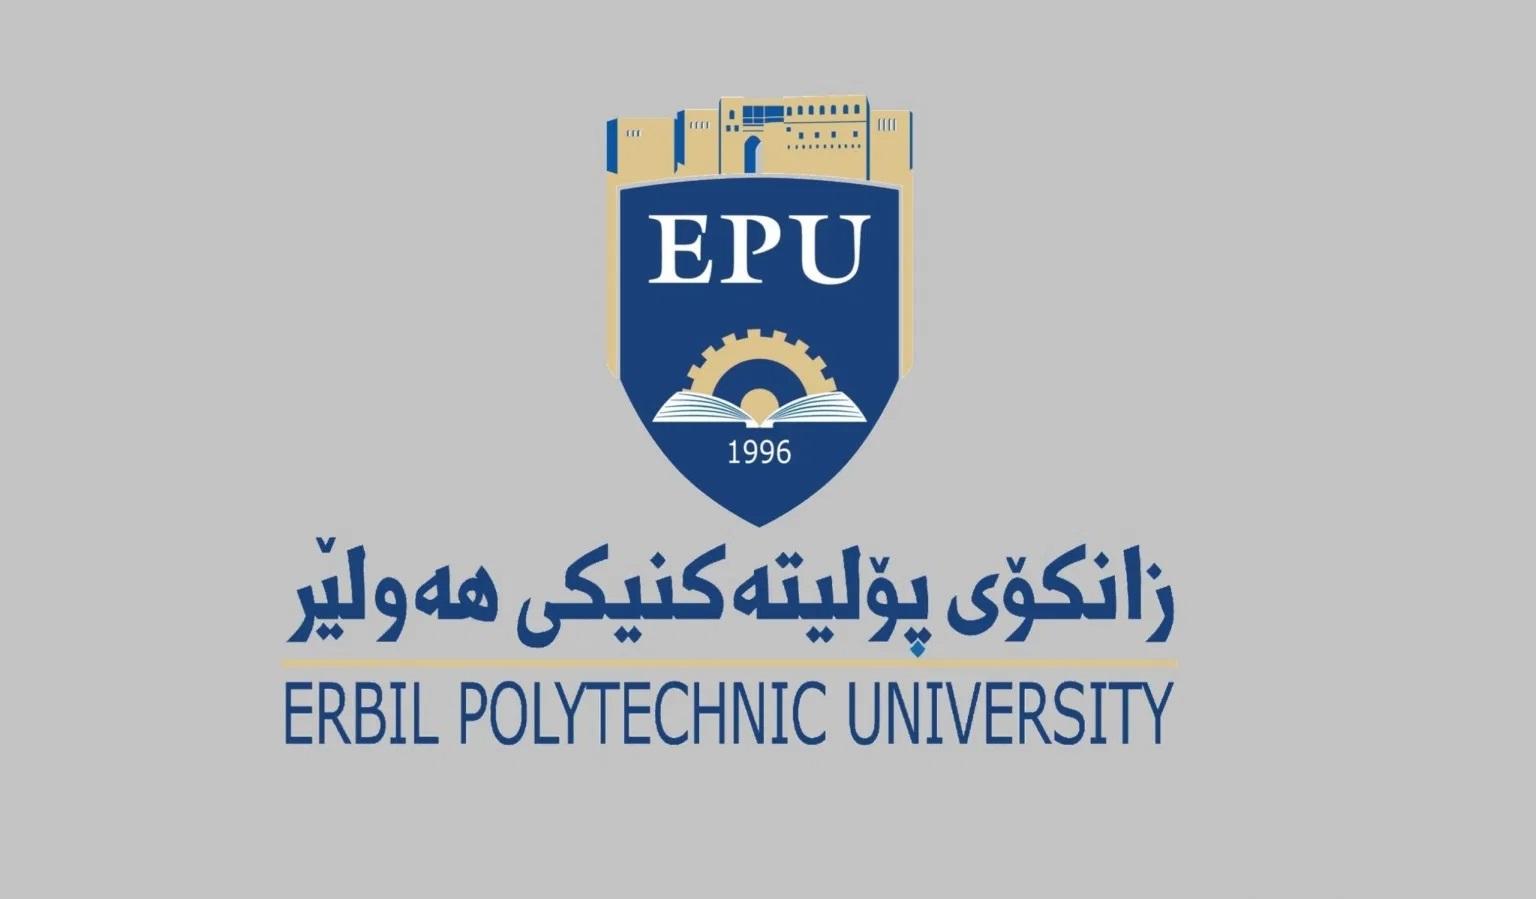 Erbil Polytechnic University Announces The Ferris State University Invitation To Join Virtual Co-Curricular Certificate  Program